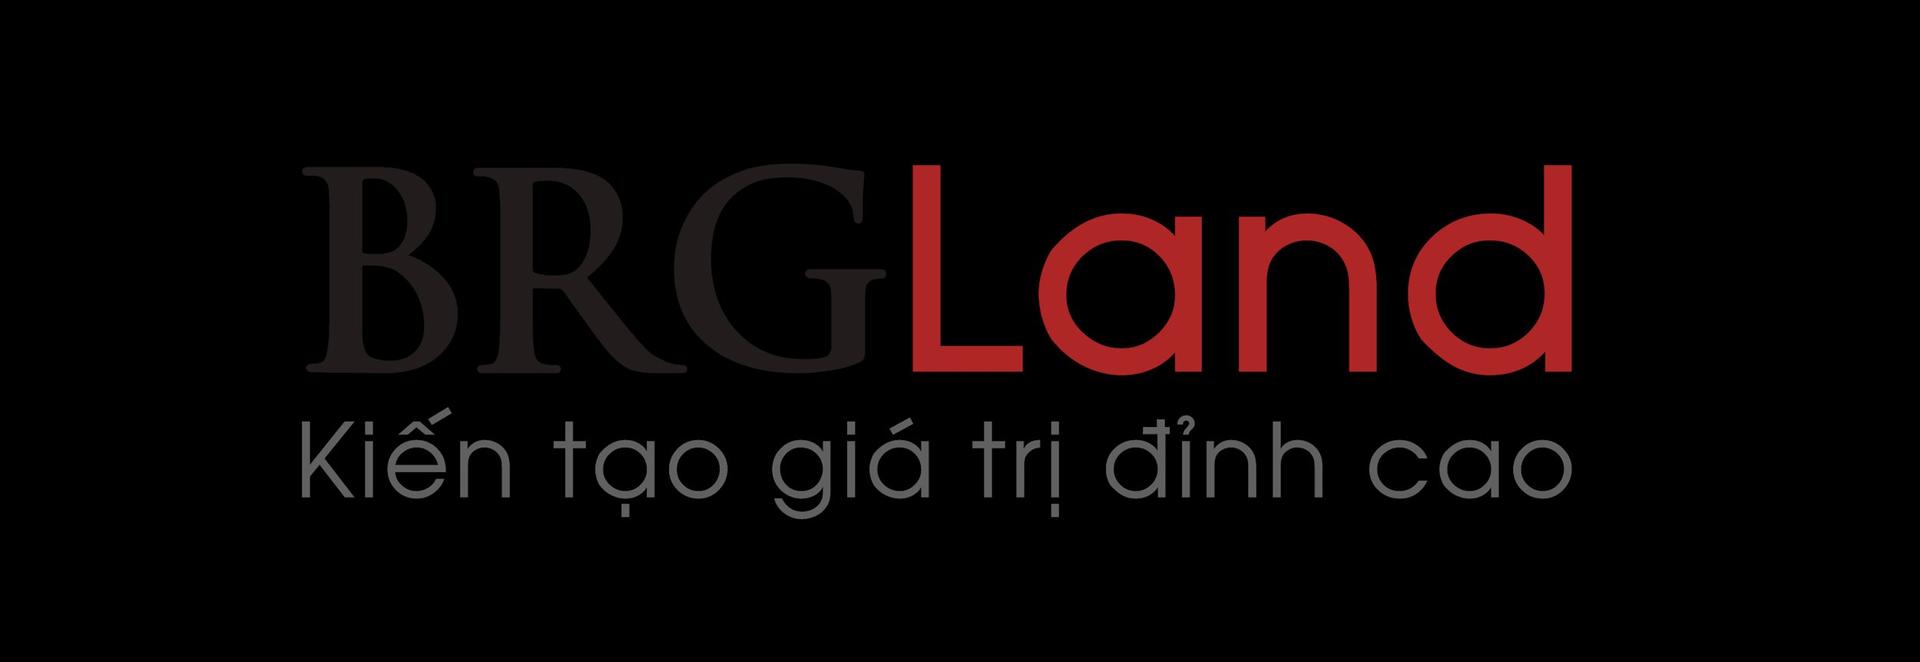 01-logo-brgland.png